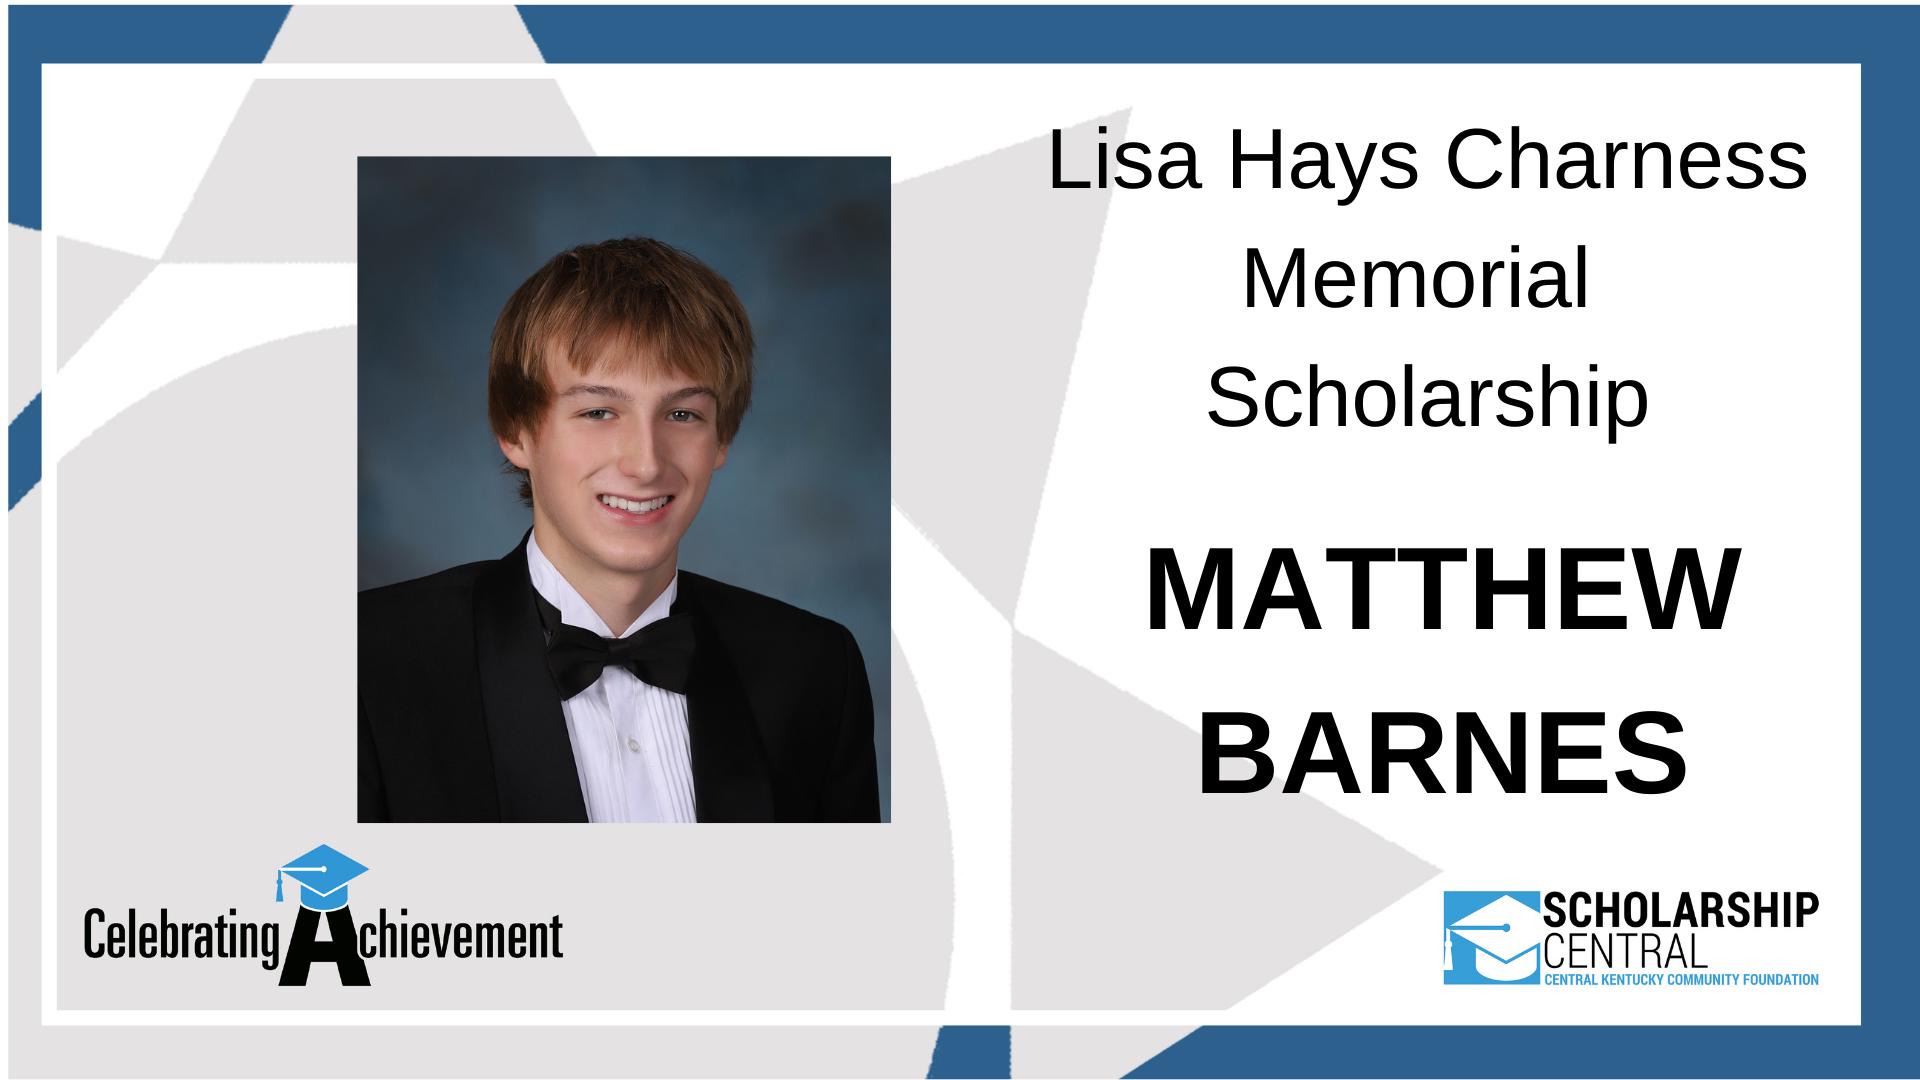 Lisa Hays Charness Memorial Scholarship Winner